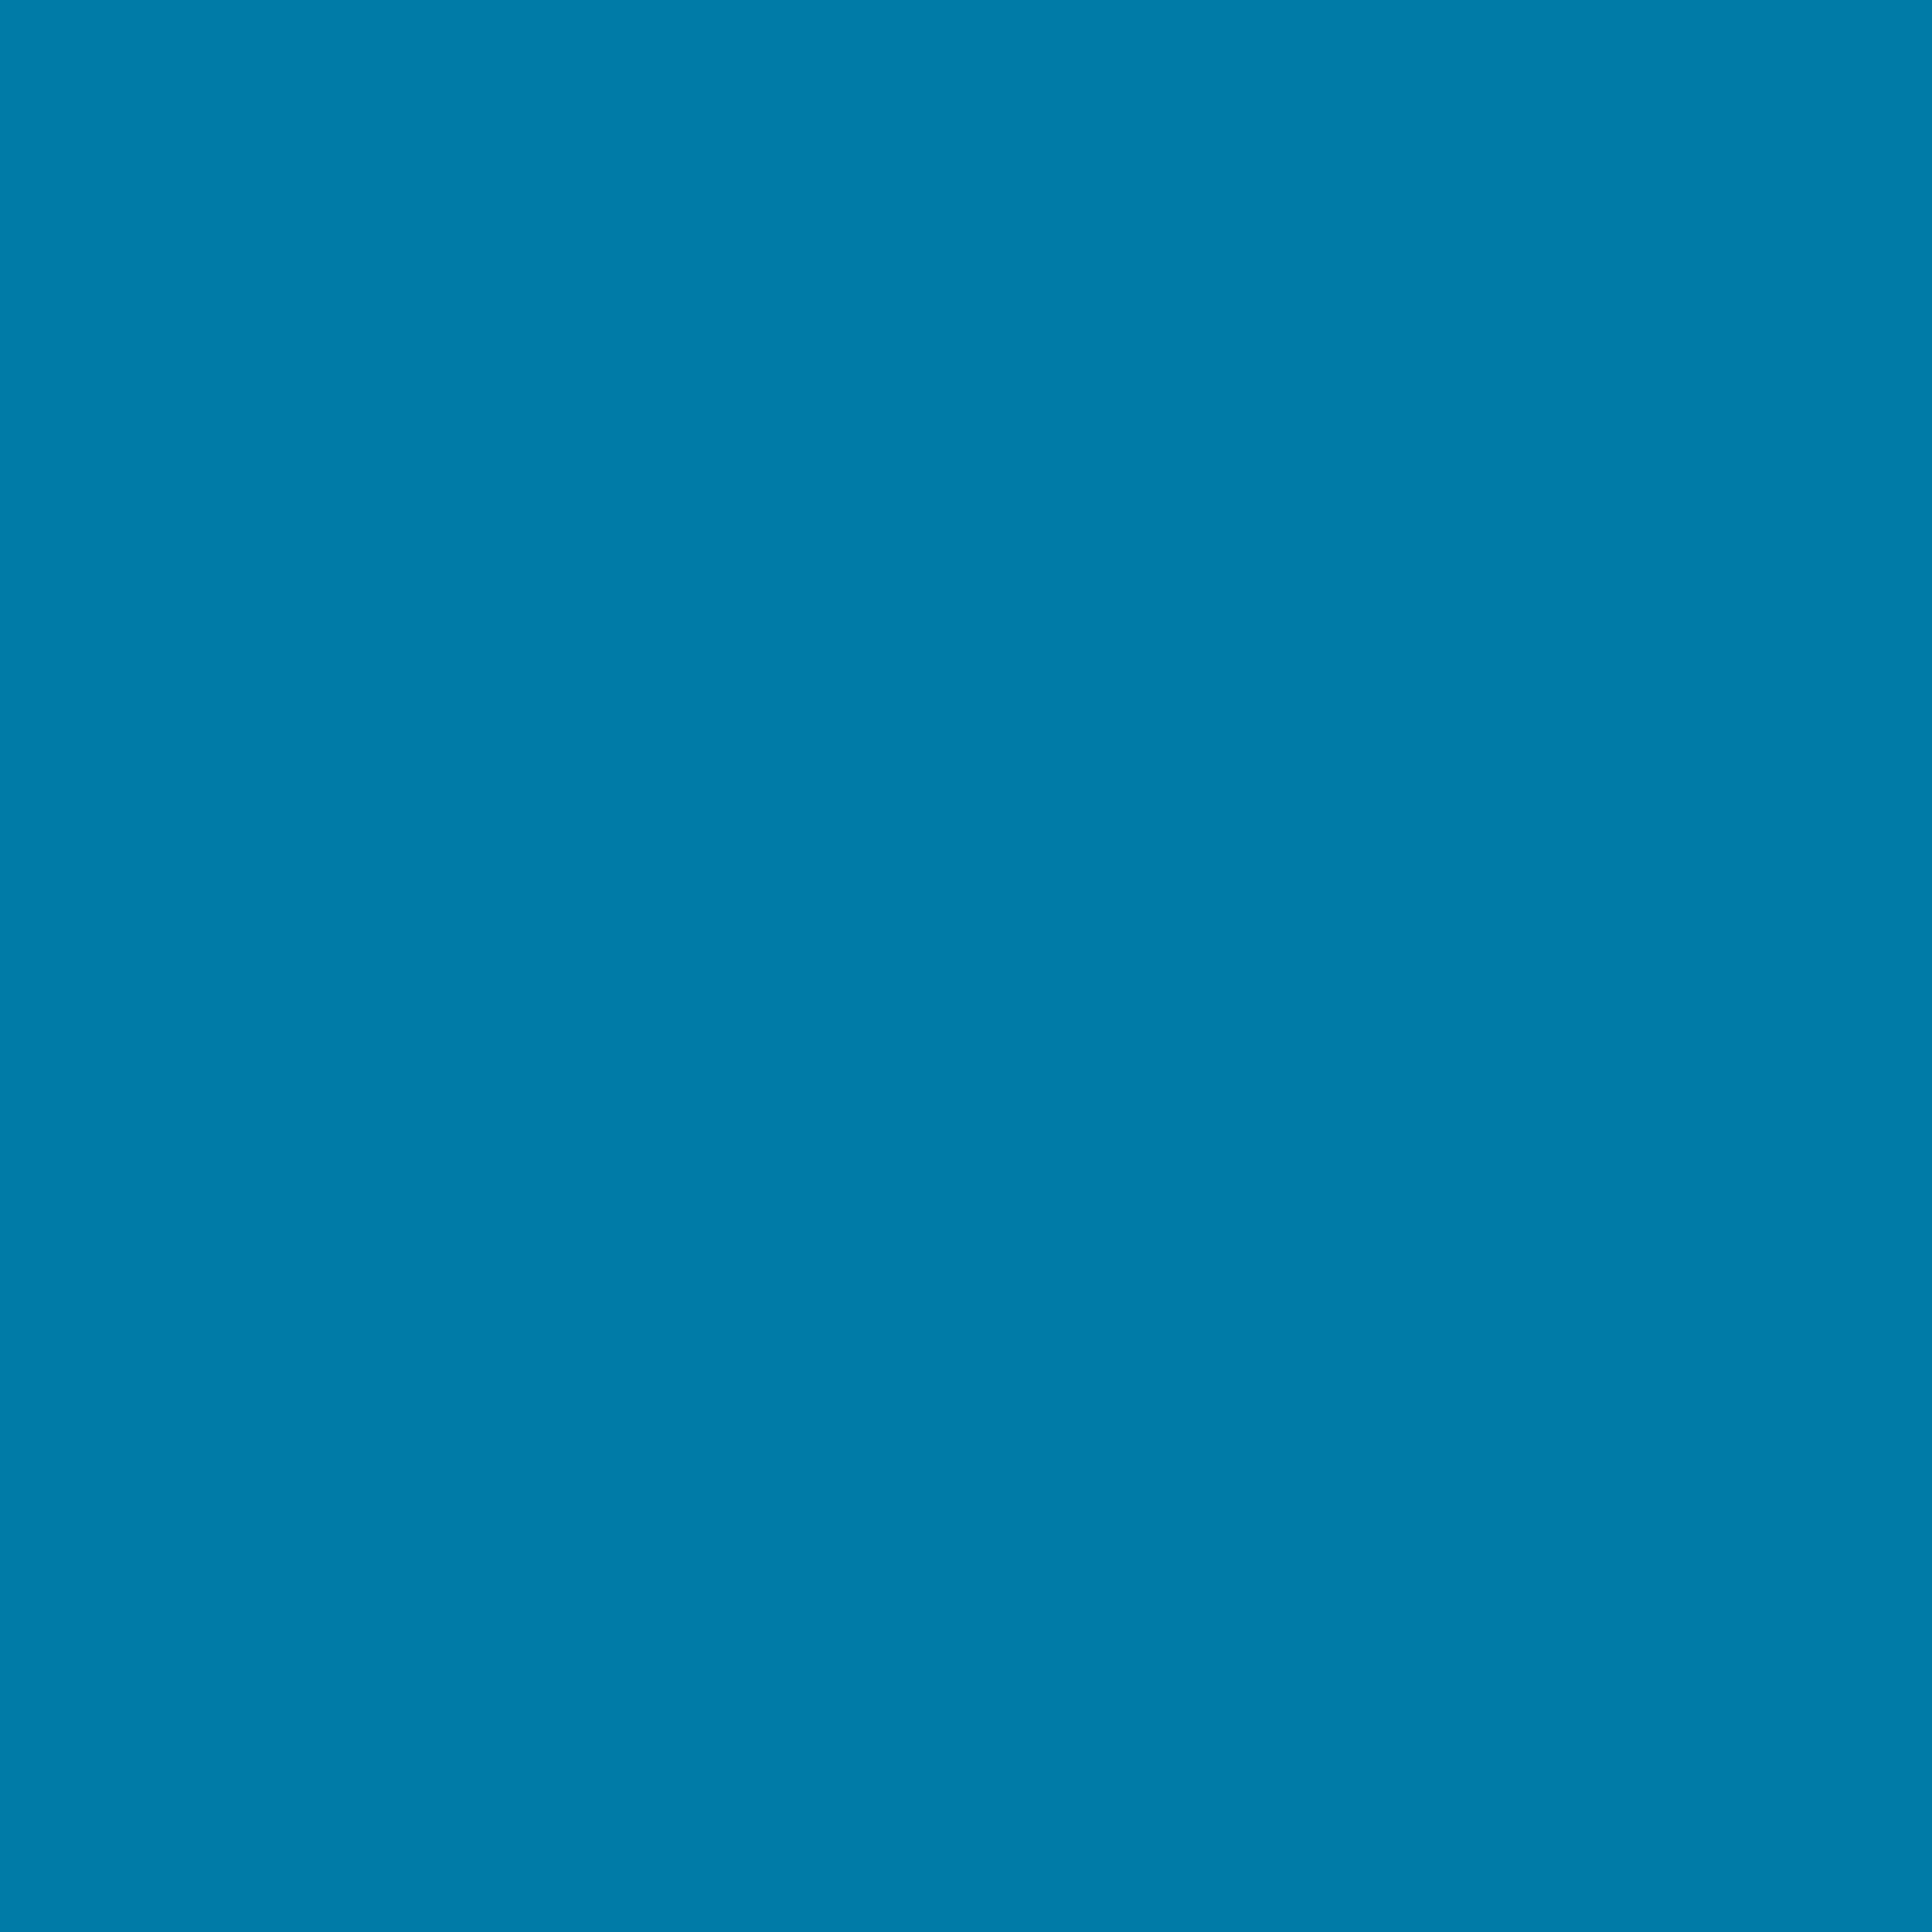 2048x2048 Celadon Blue Solid Color Background